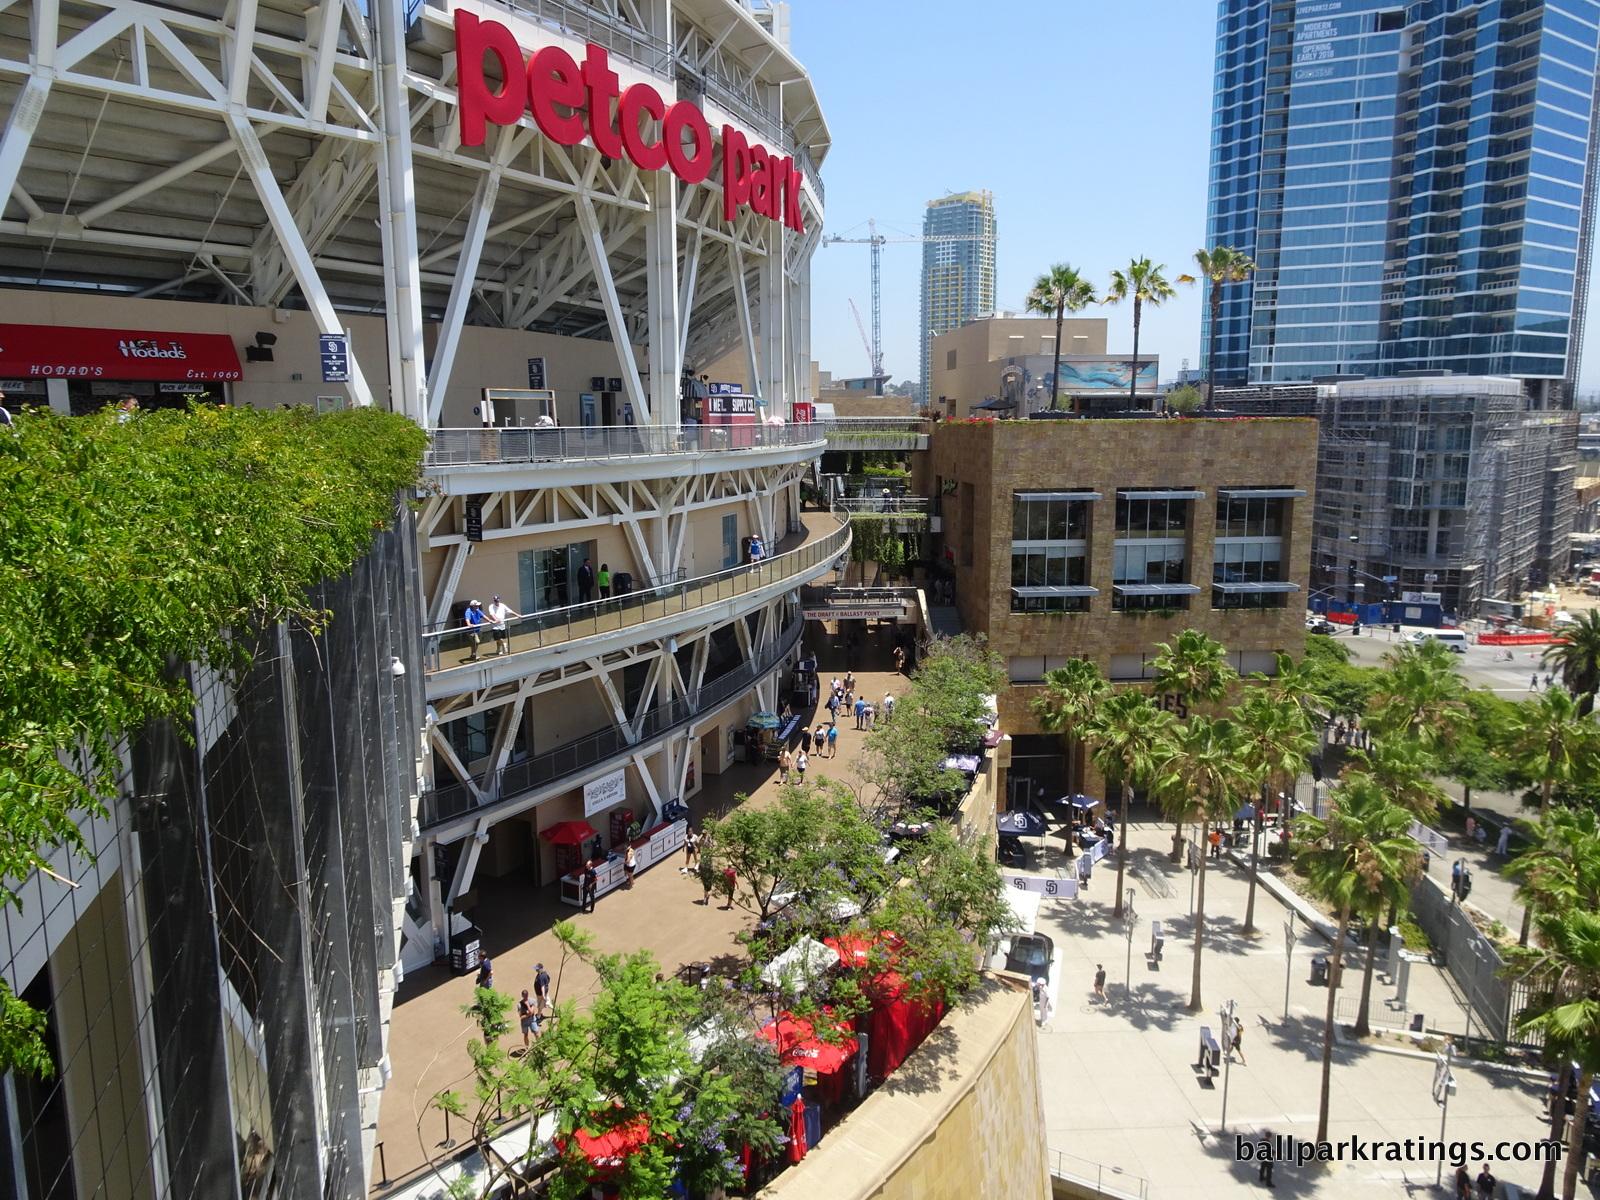 Petco Park concourses